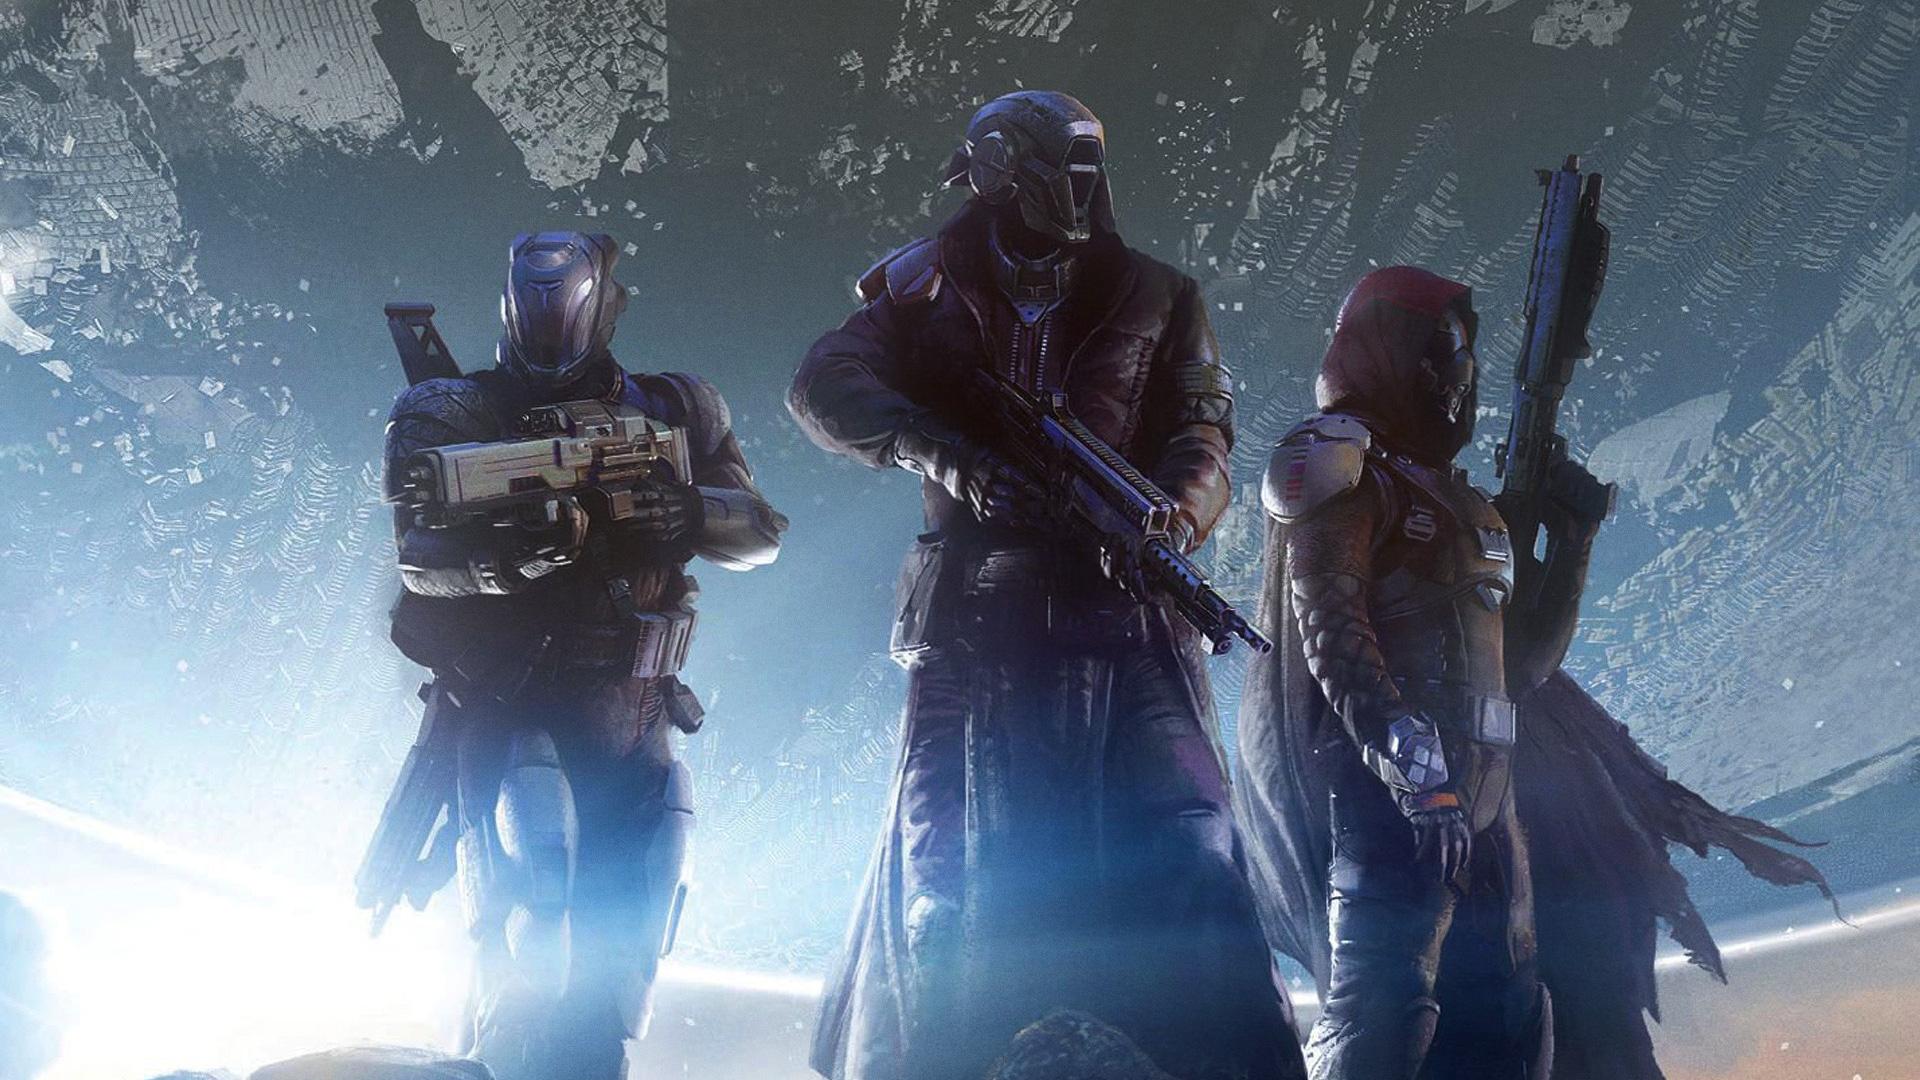 destiny game wallpaper